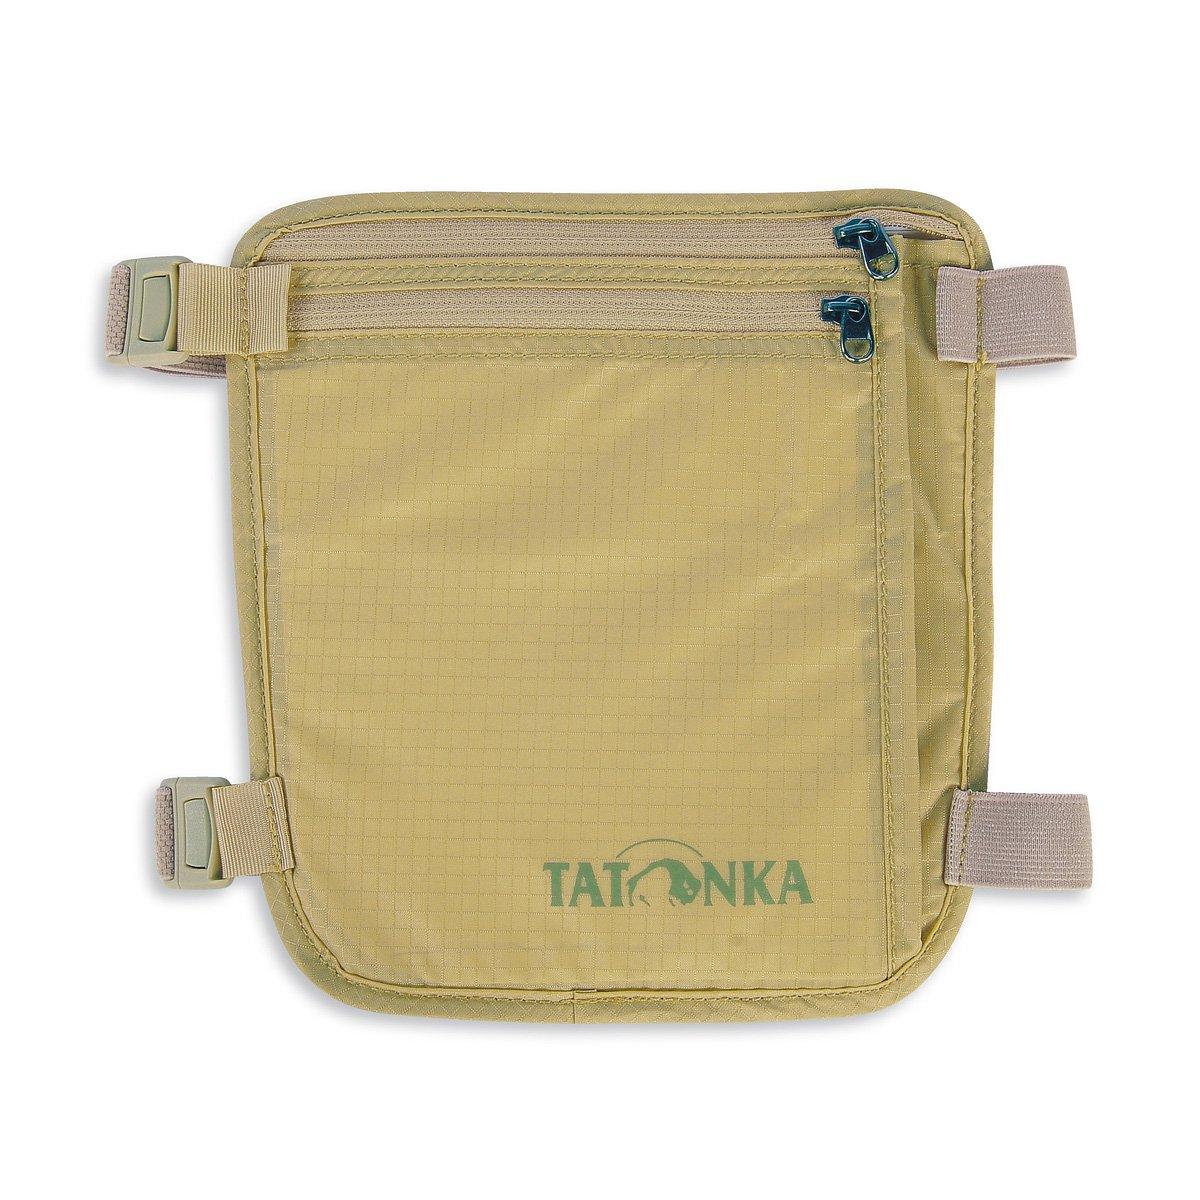 Tatonka Skin Pochette secrète 2854